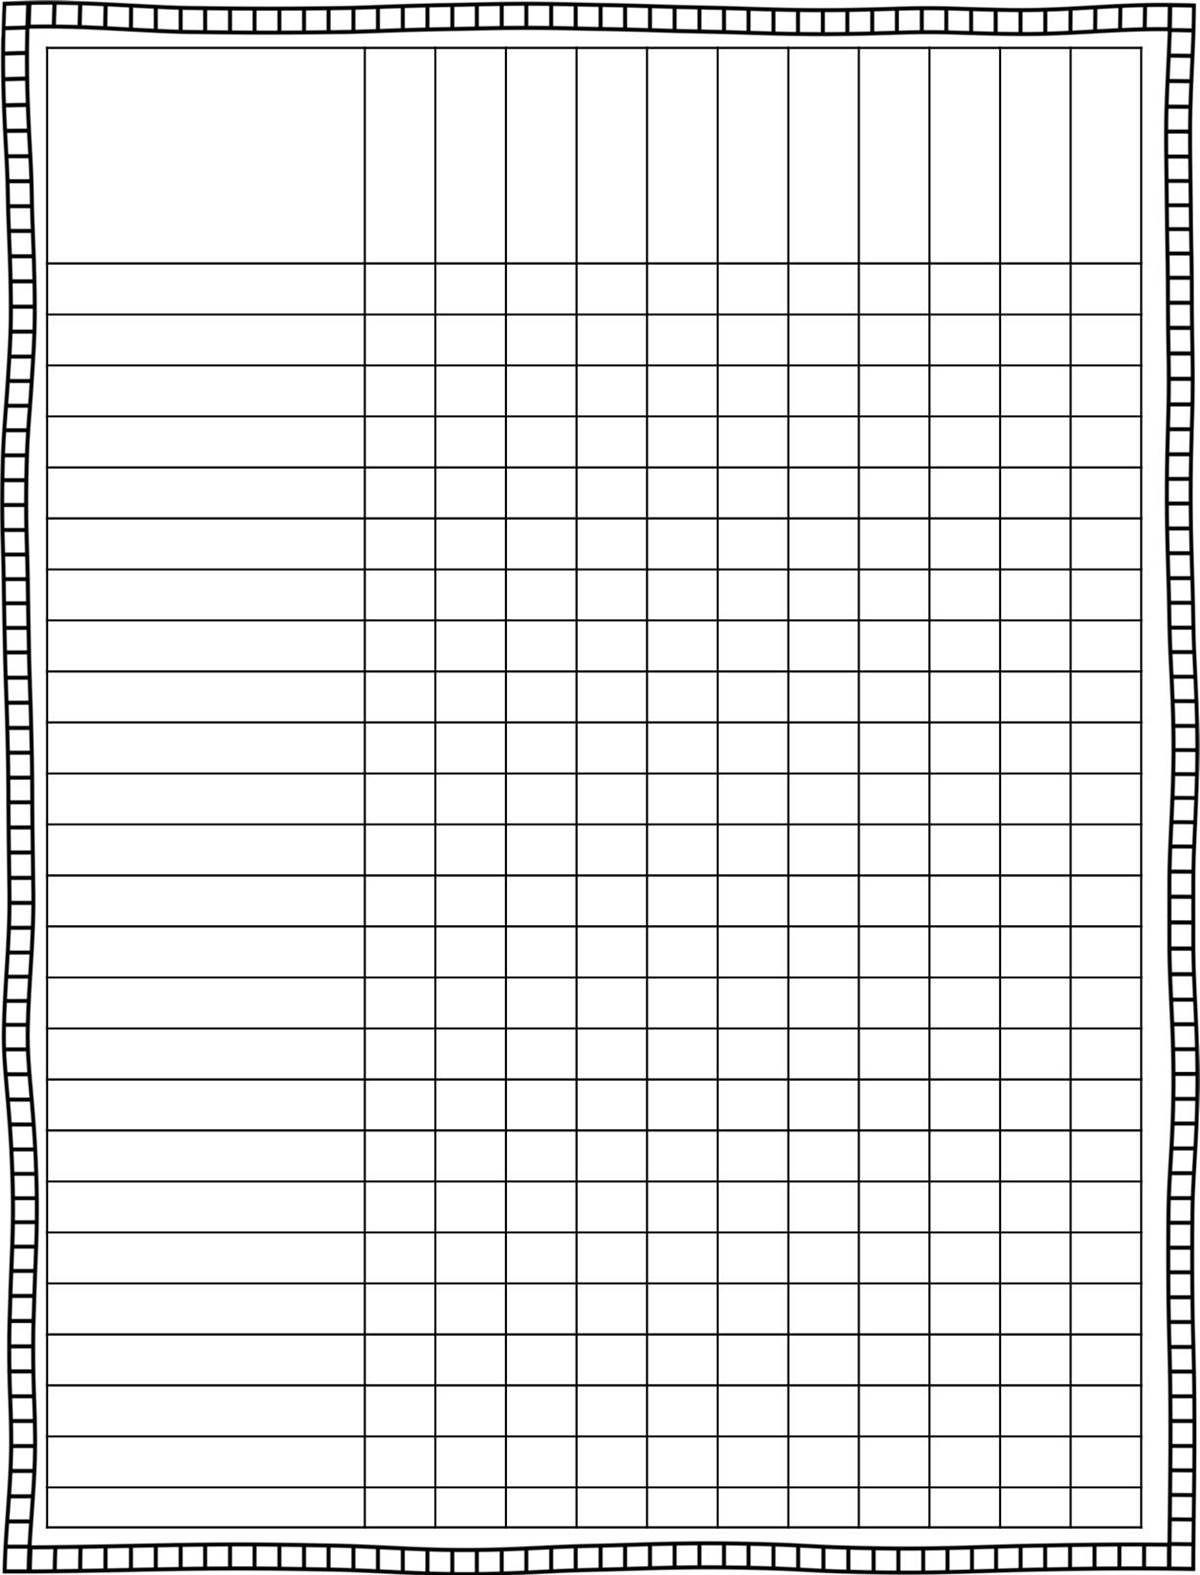 Classroom Schedule Template For Teachers